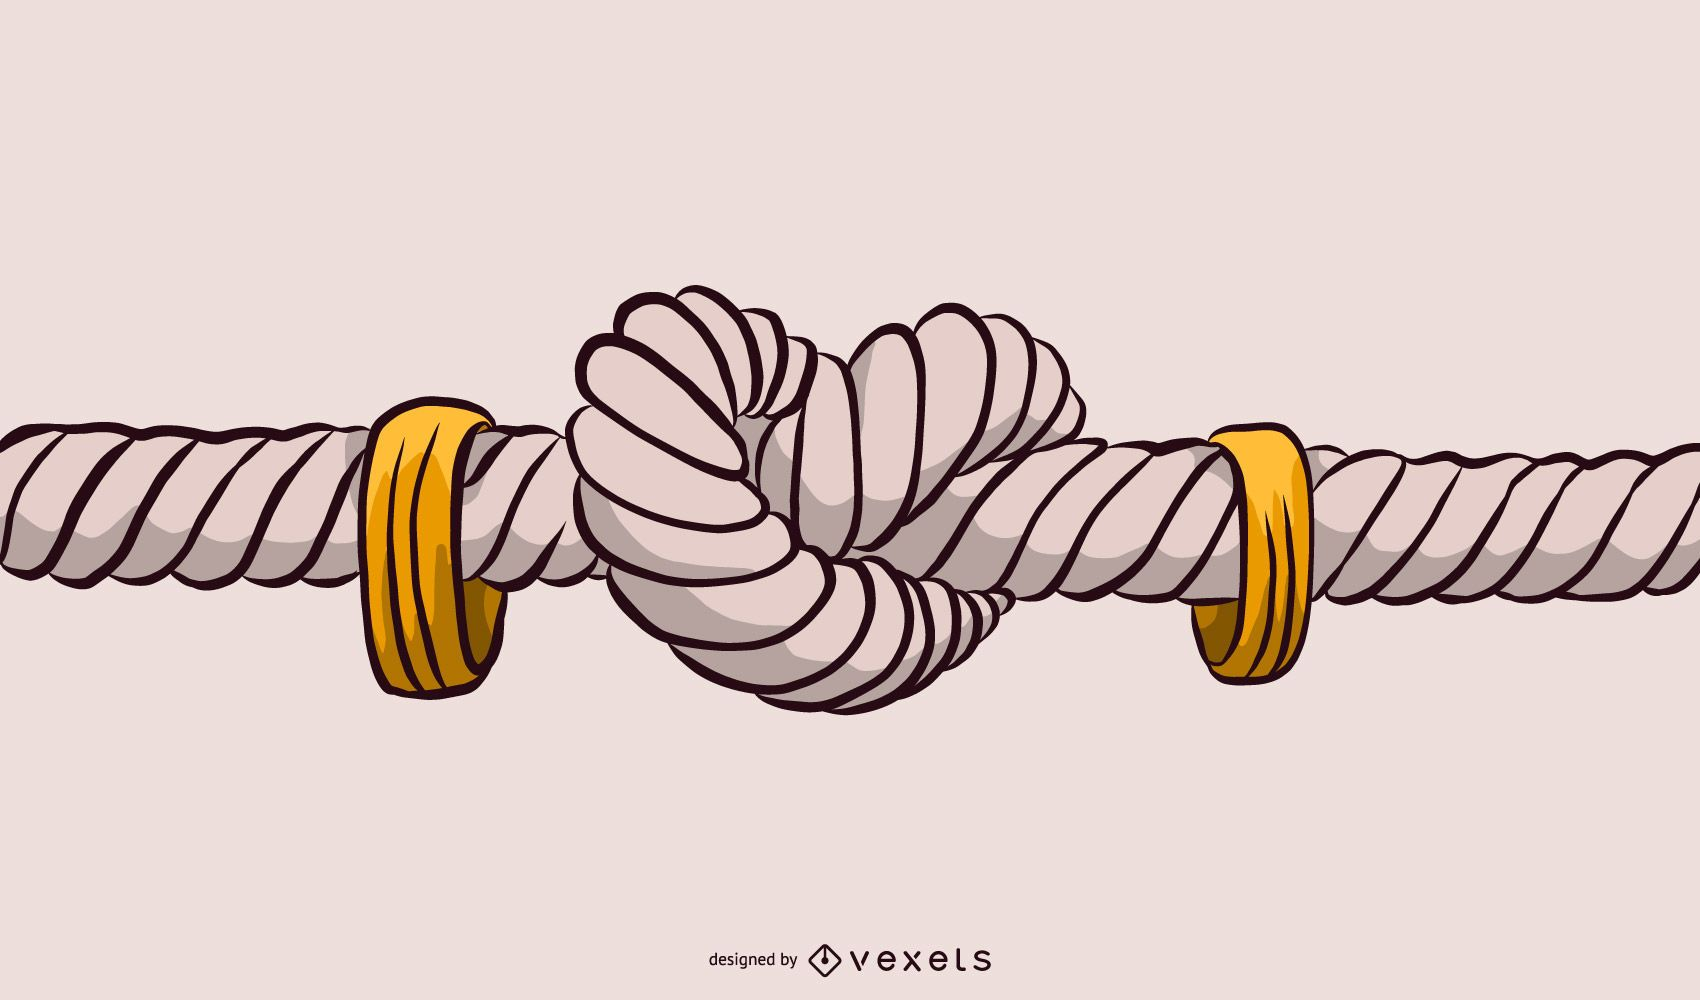 Rope Knot Illustration